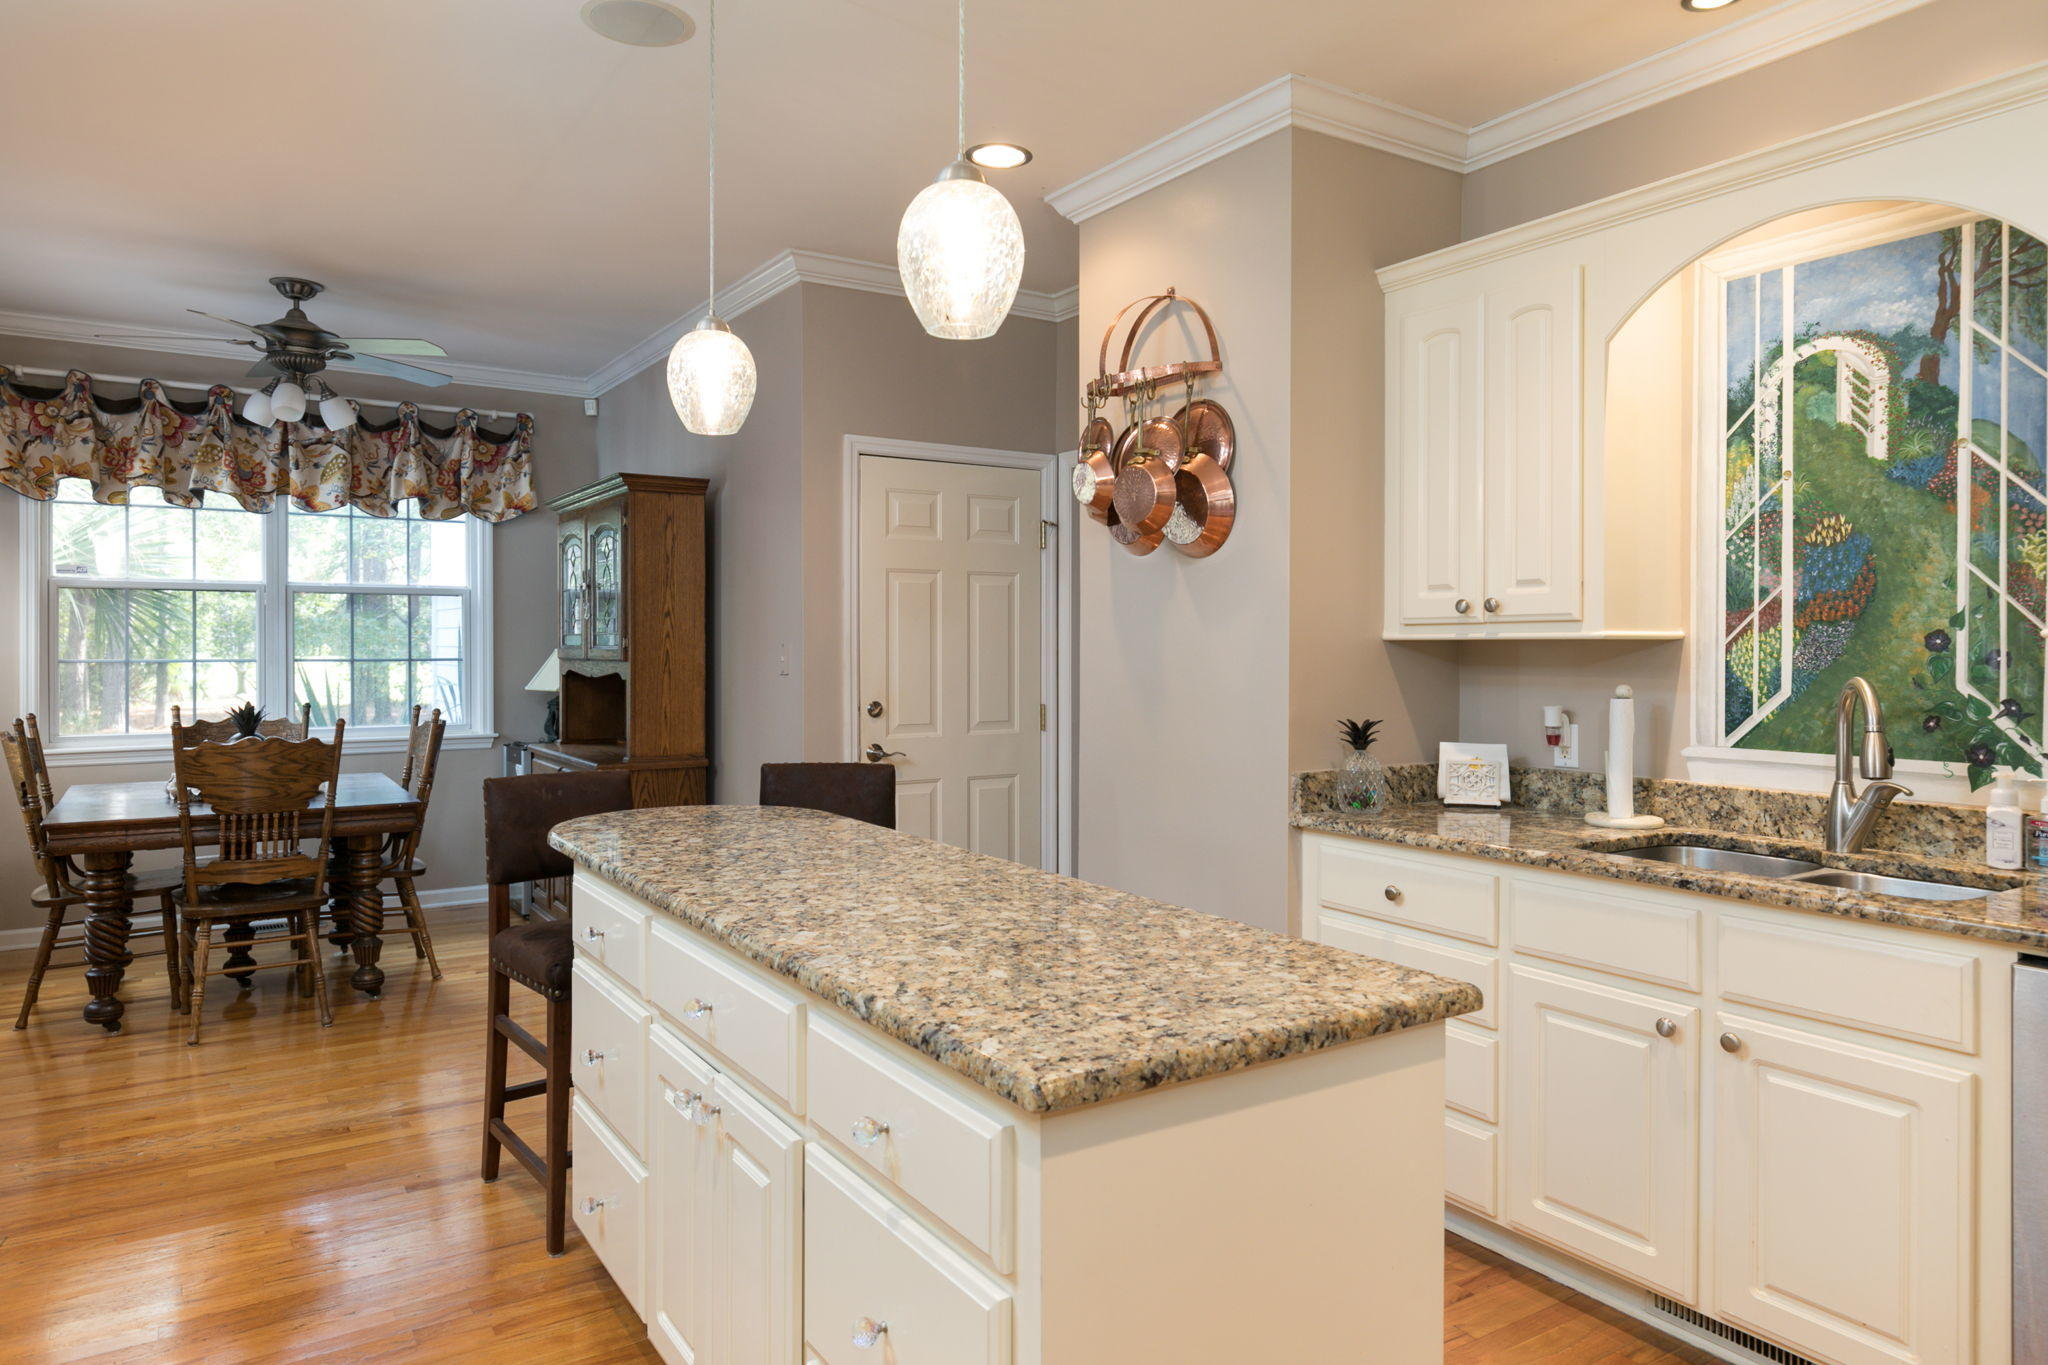 Dunes West Homes For Sale - 3625 Colonel Vanderhorst, Mount Pleasant, SC - 24